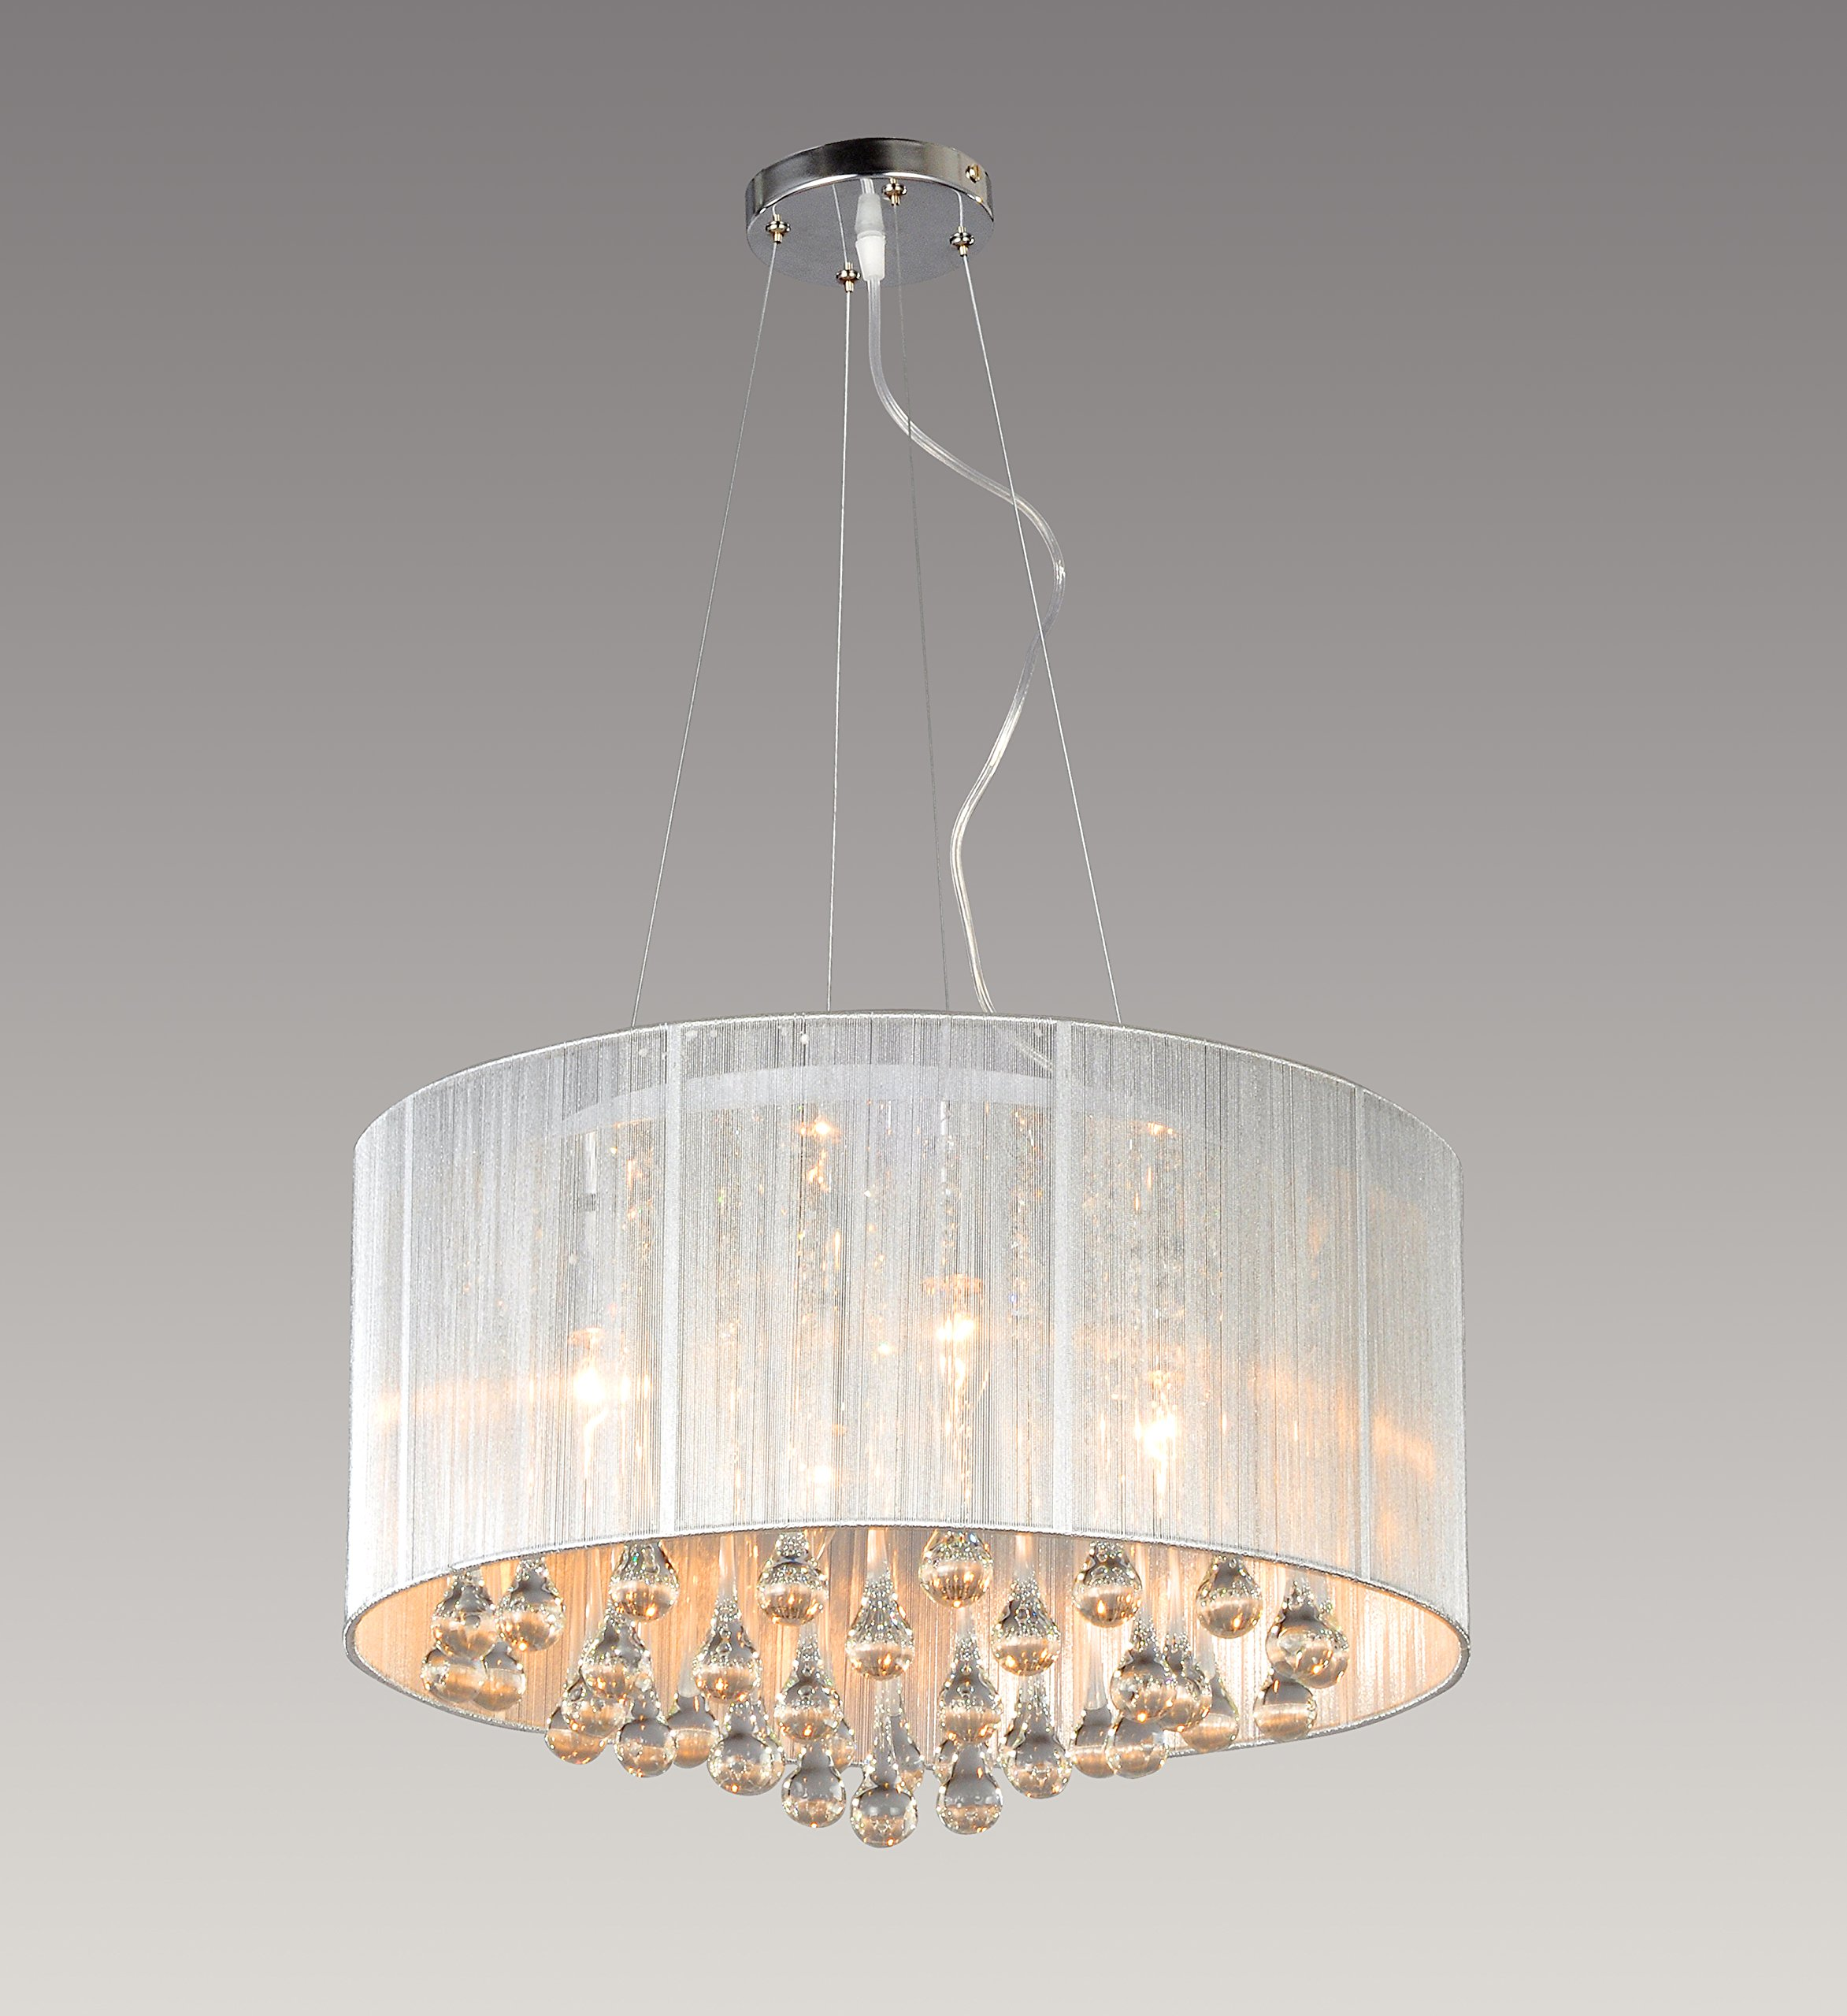 maso home MS-29021 Acrylic and Wring line Pendant Light